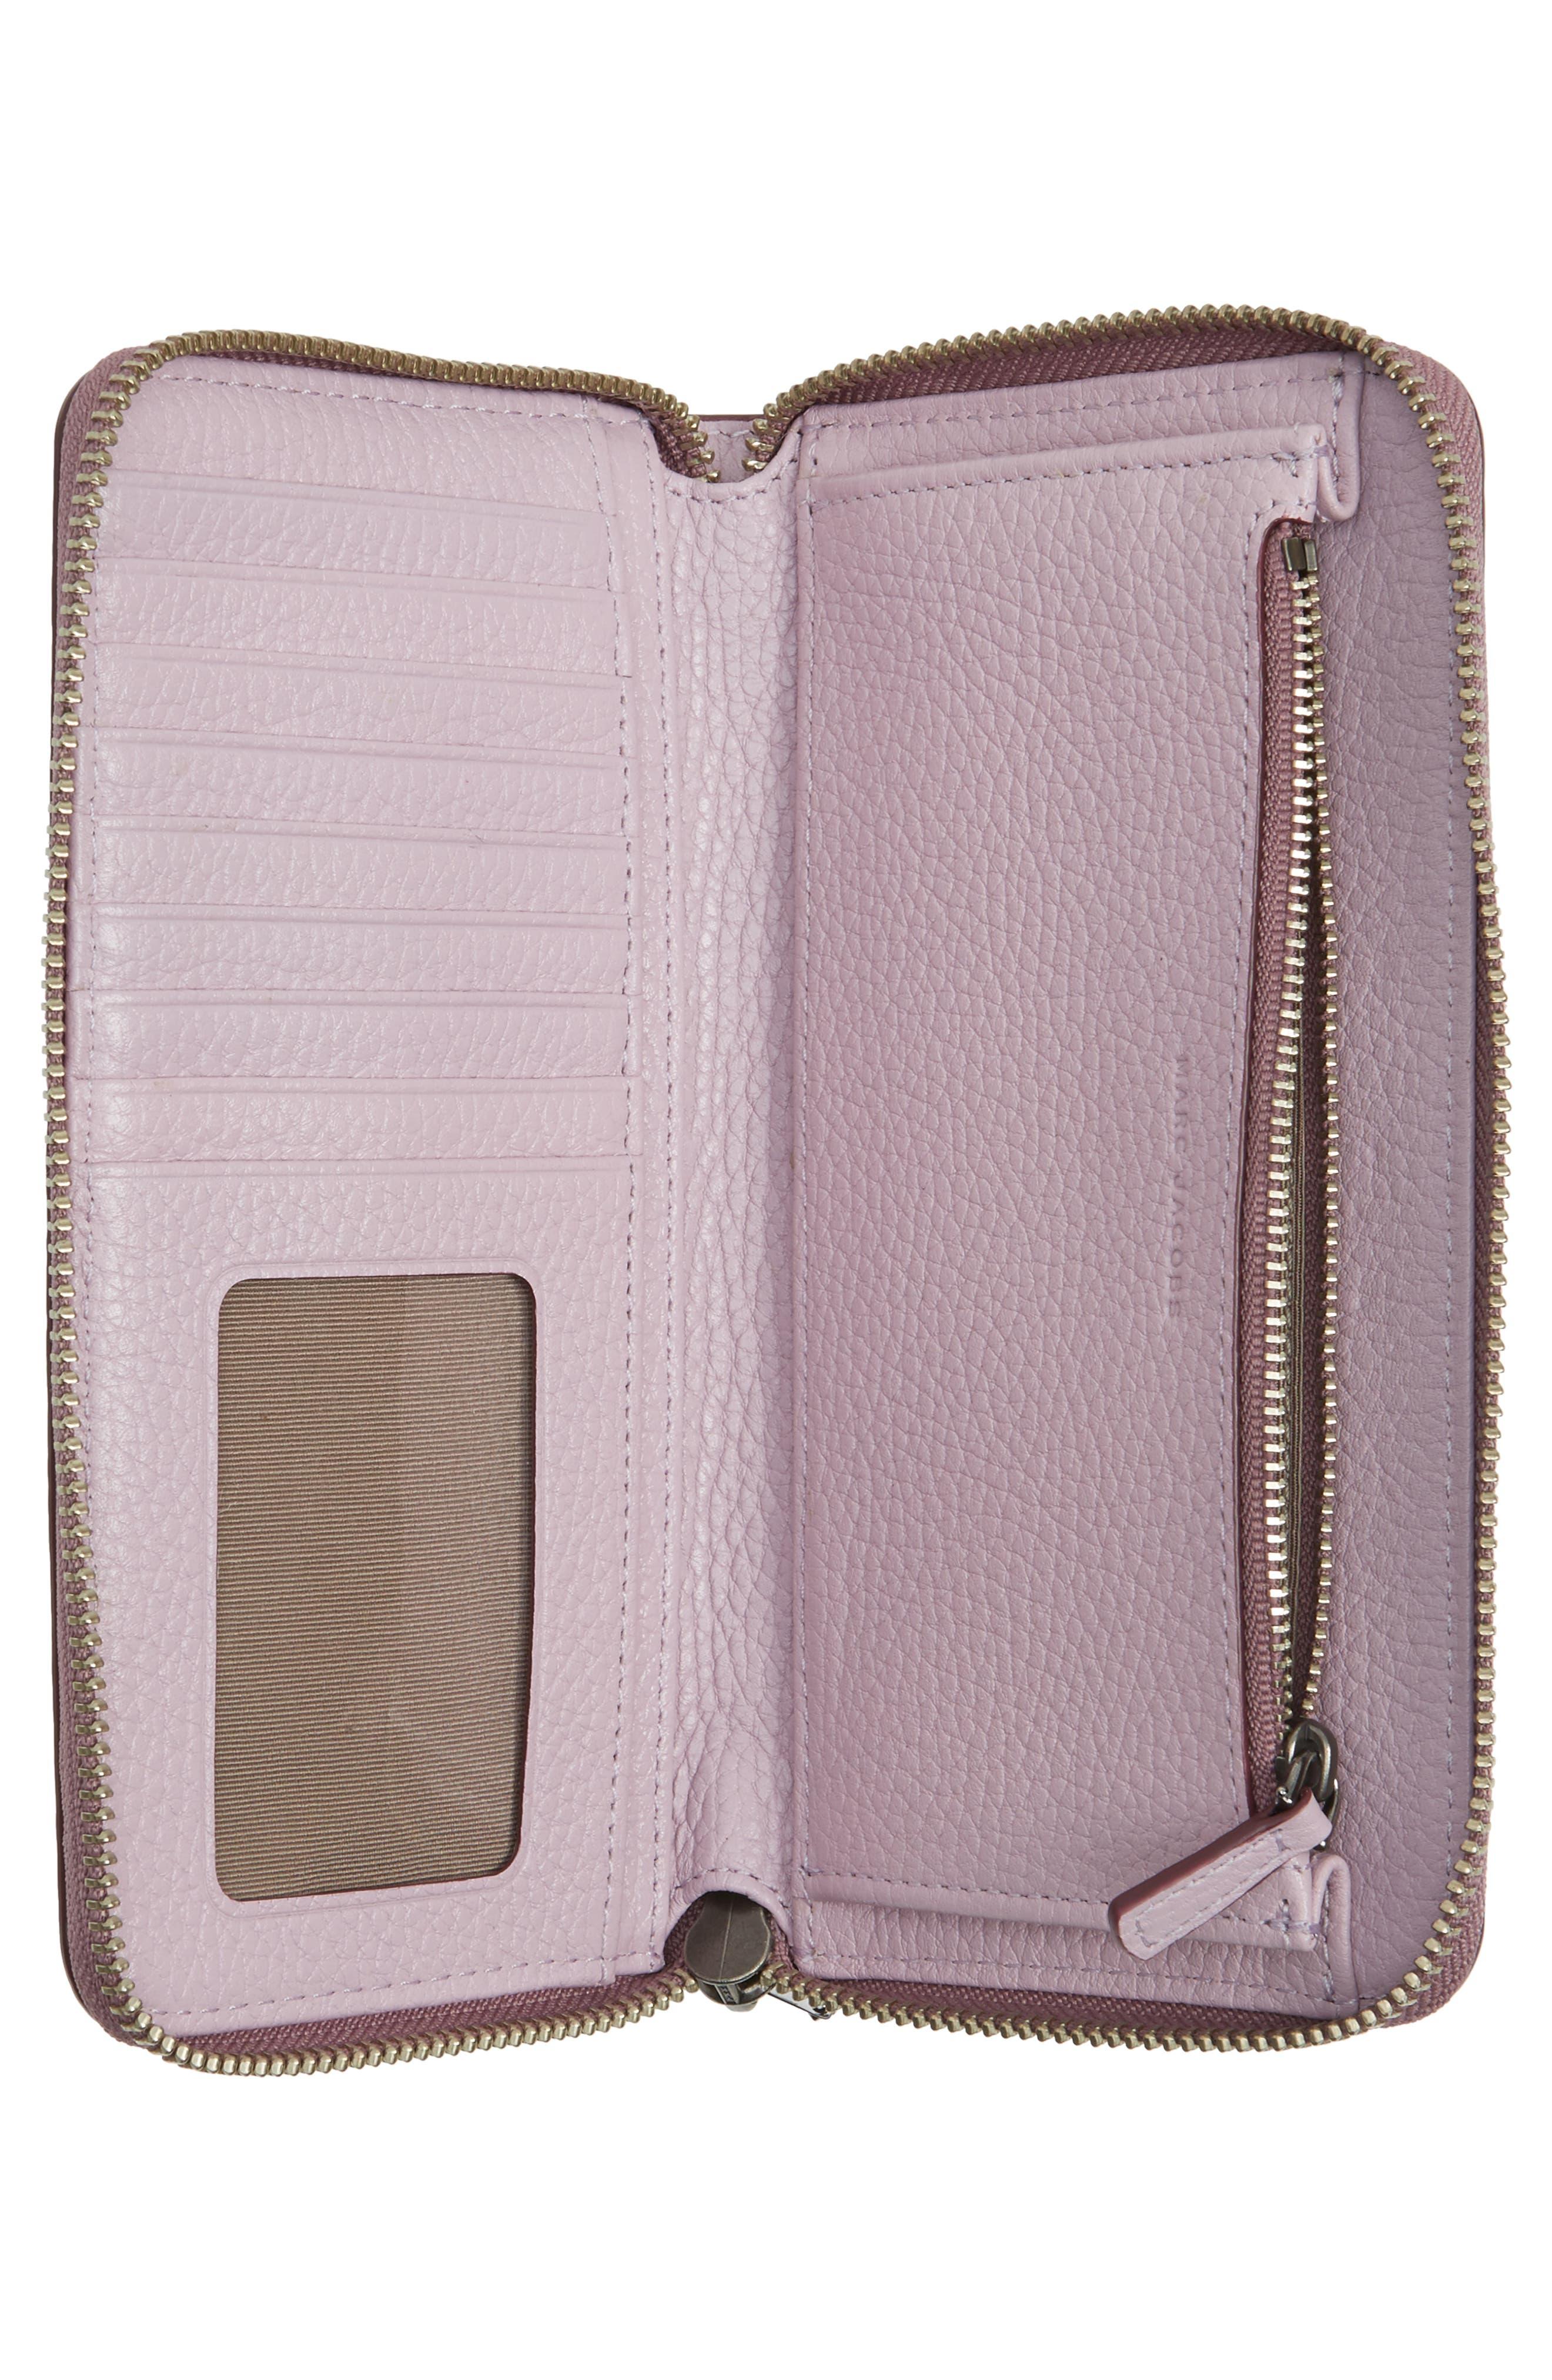 'Recruit Vertical' Leather Wallet,                             Alternate thumbnail 4, color,                             500